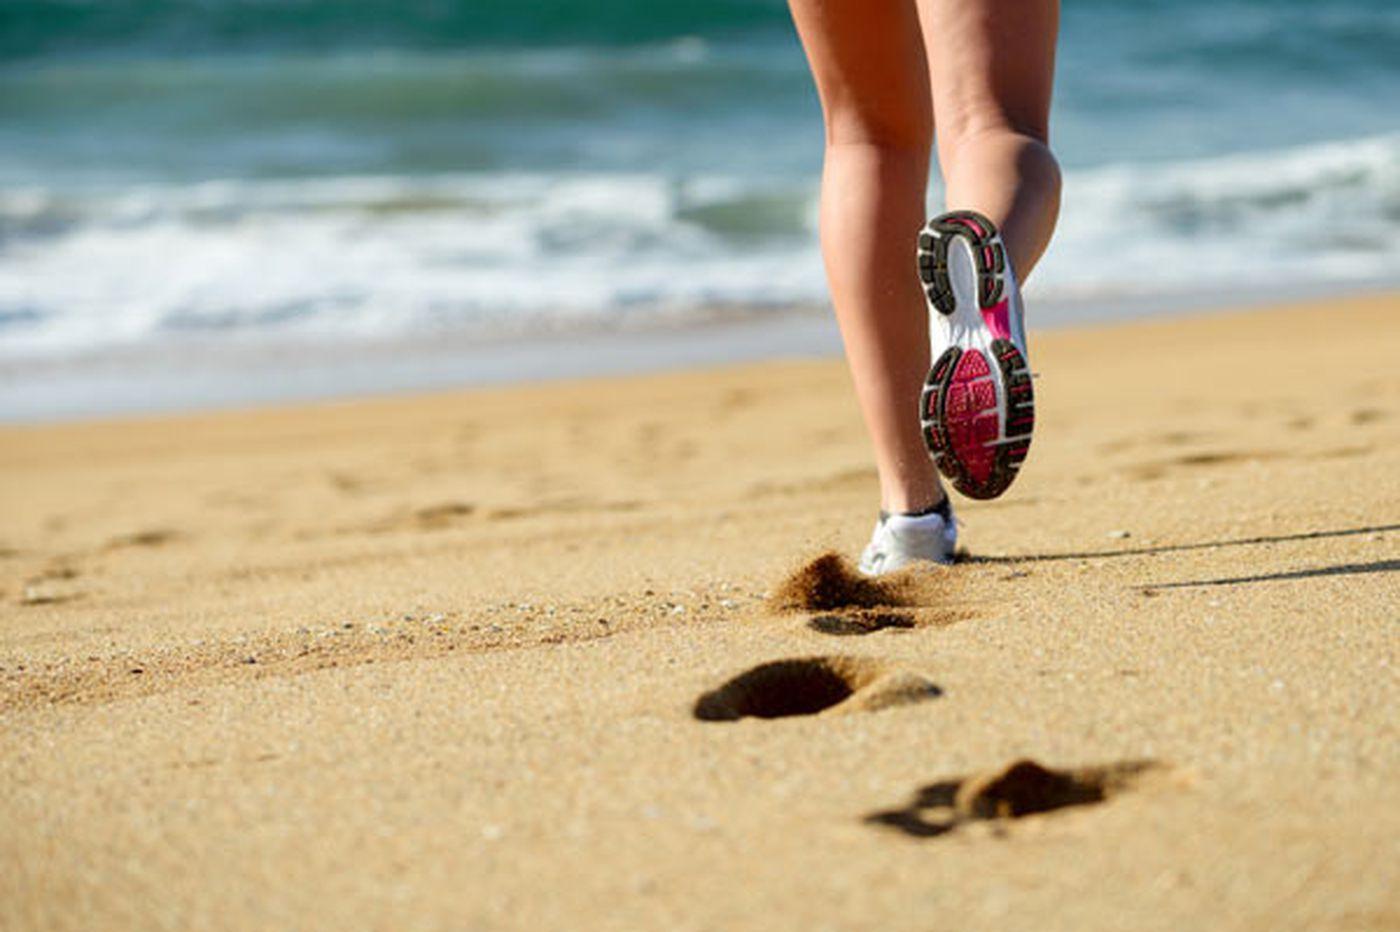 Running: Pier Pressure? Go Run a Mile on the Beach